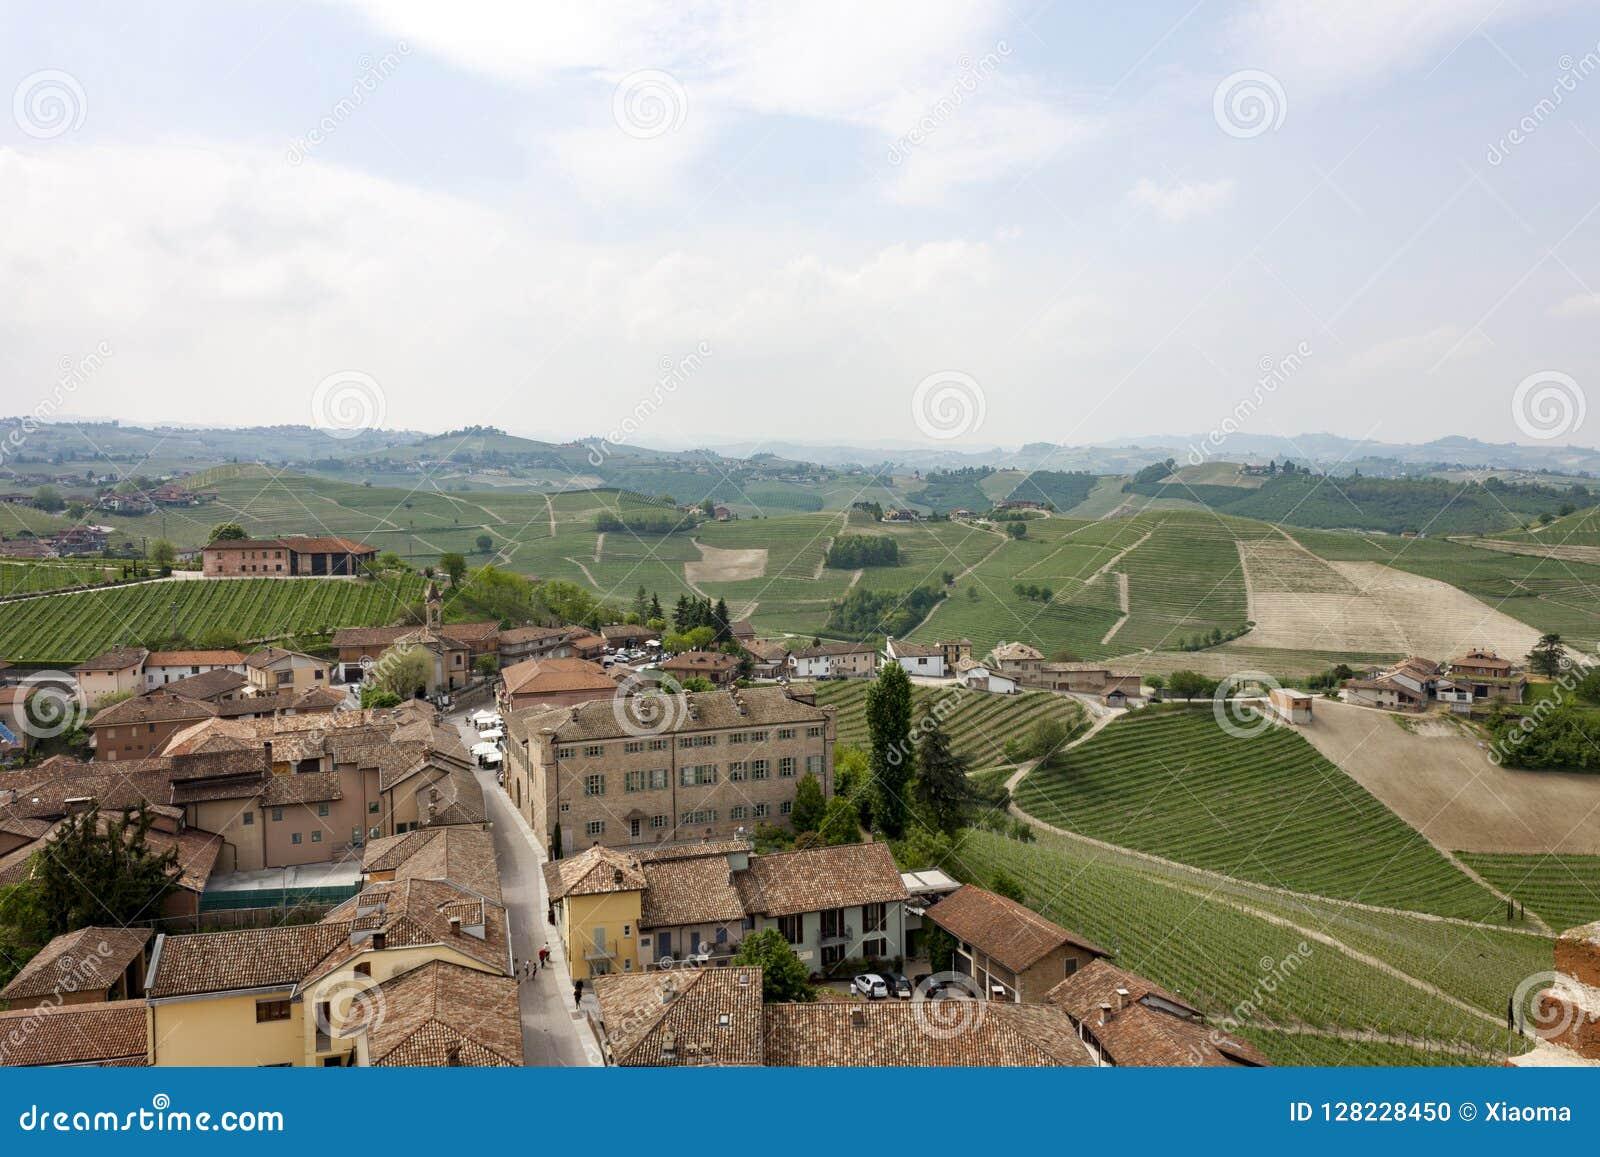 Aerial view of the vineyards of Barbaresco, Piedmont.